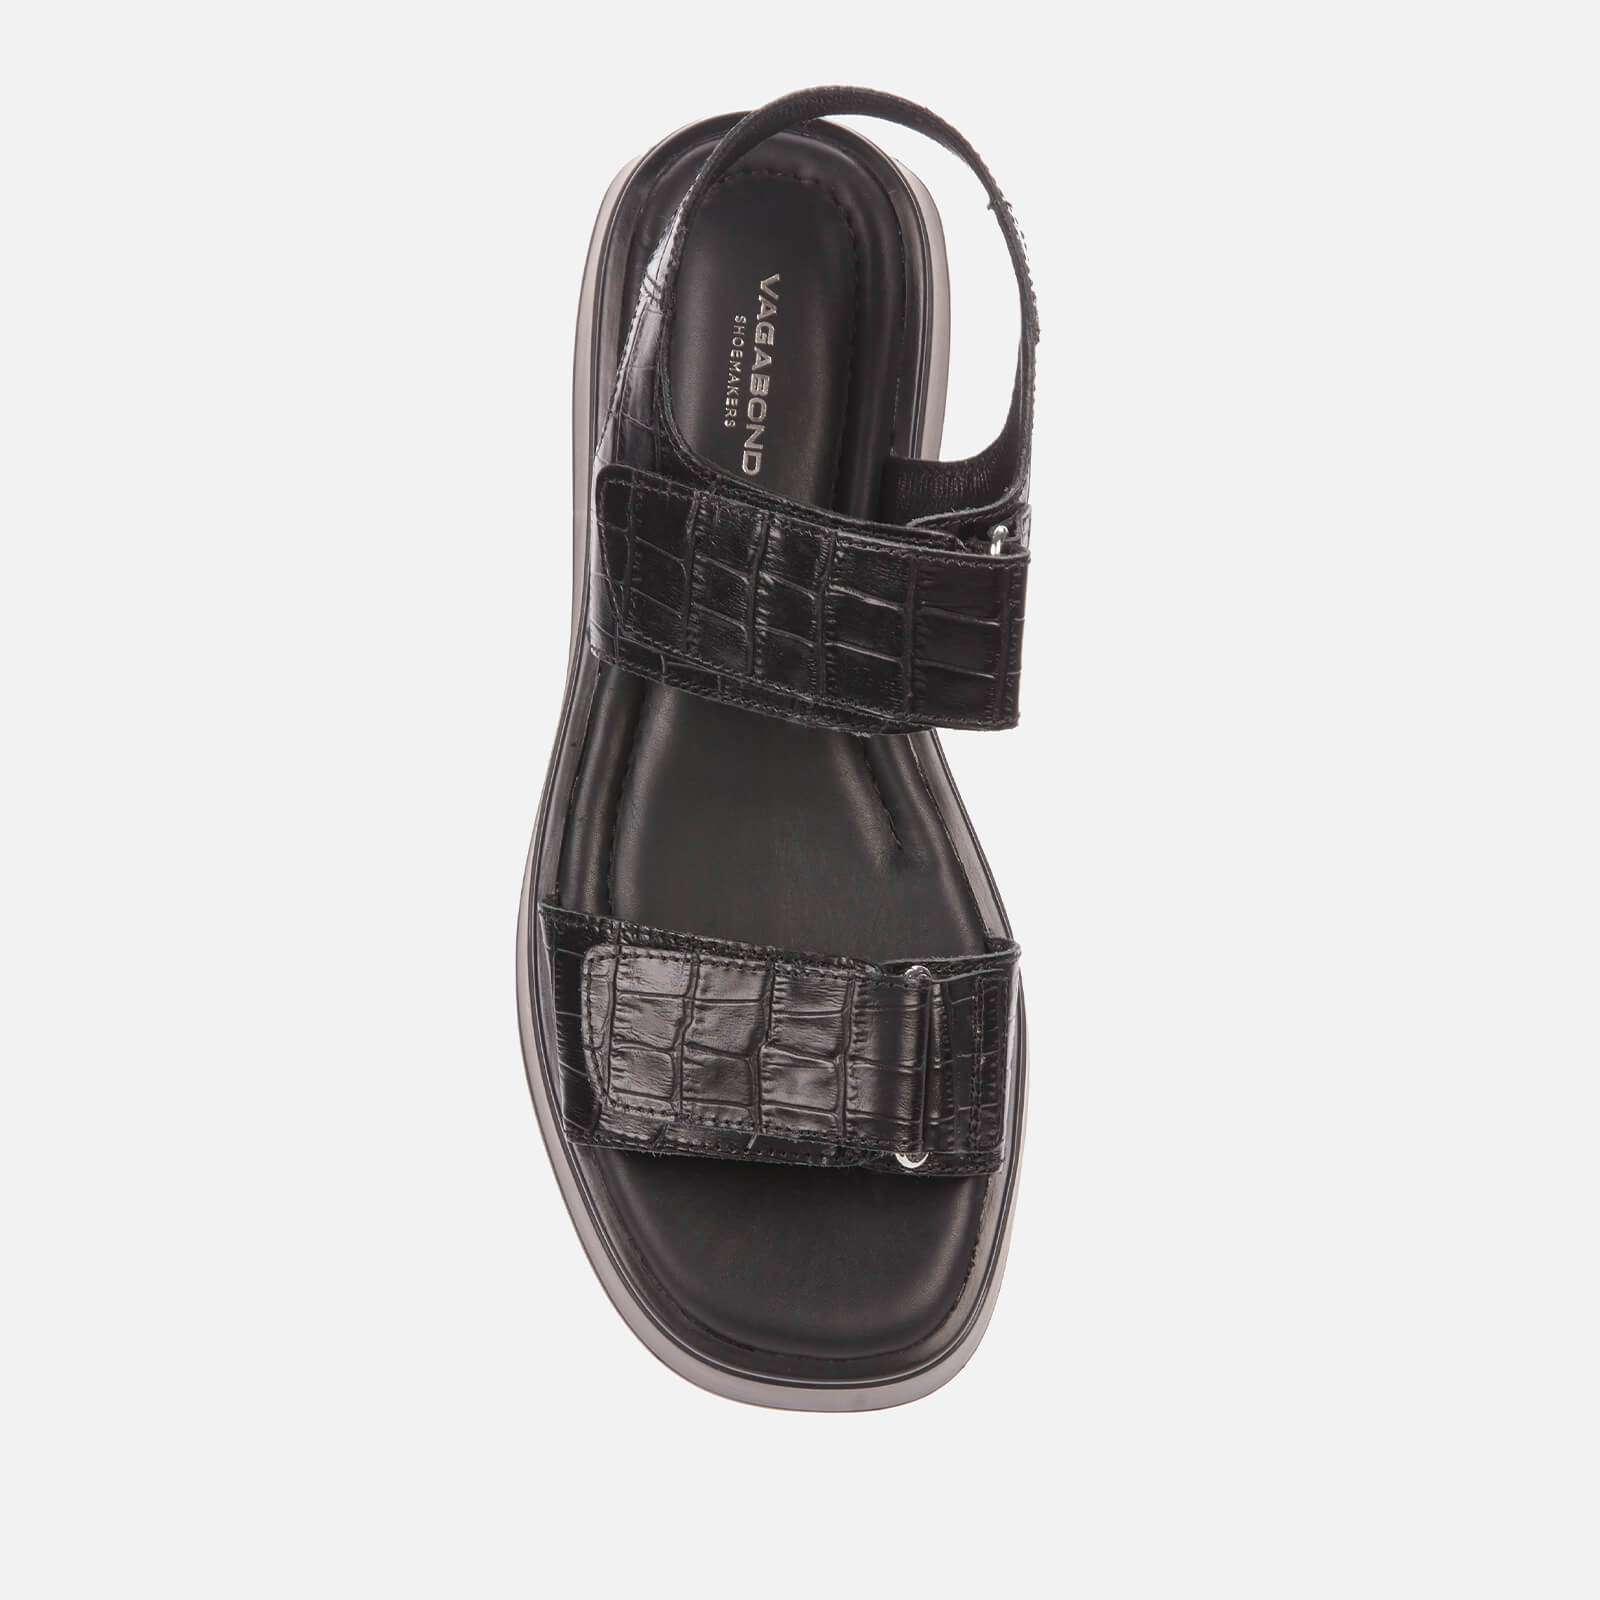 Vagabond Women's Courtney Embossed Leather Double Strap Sandals - Black/Black - Uk 6